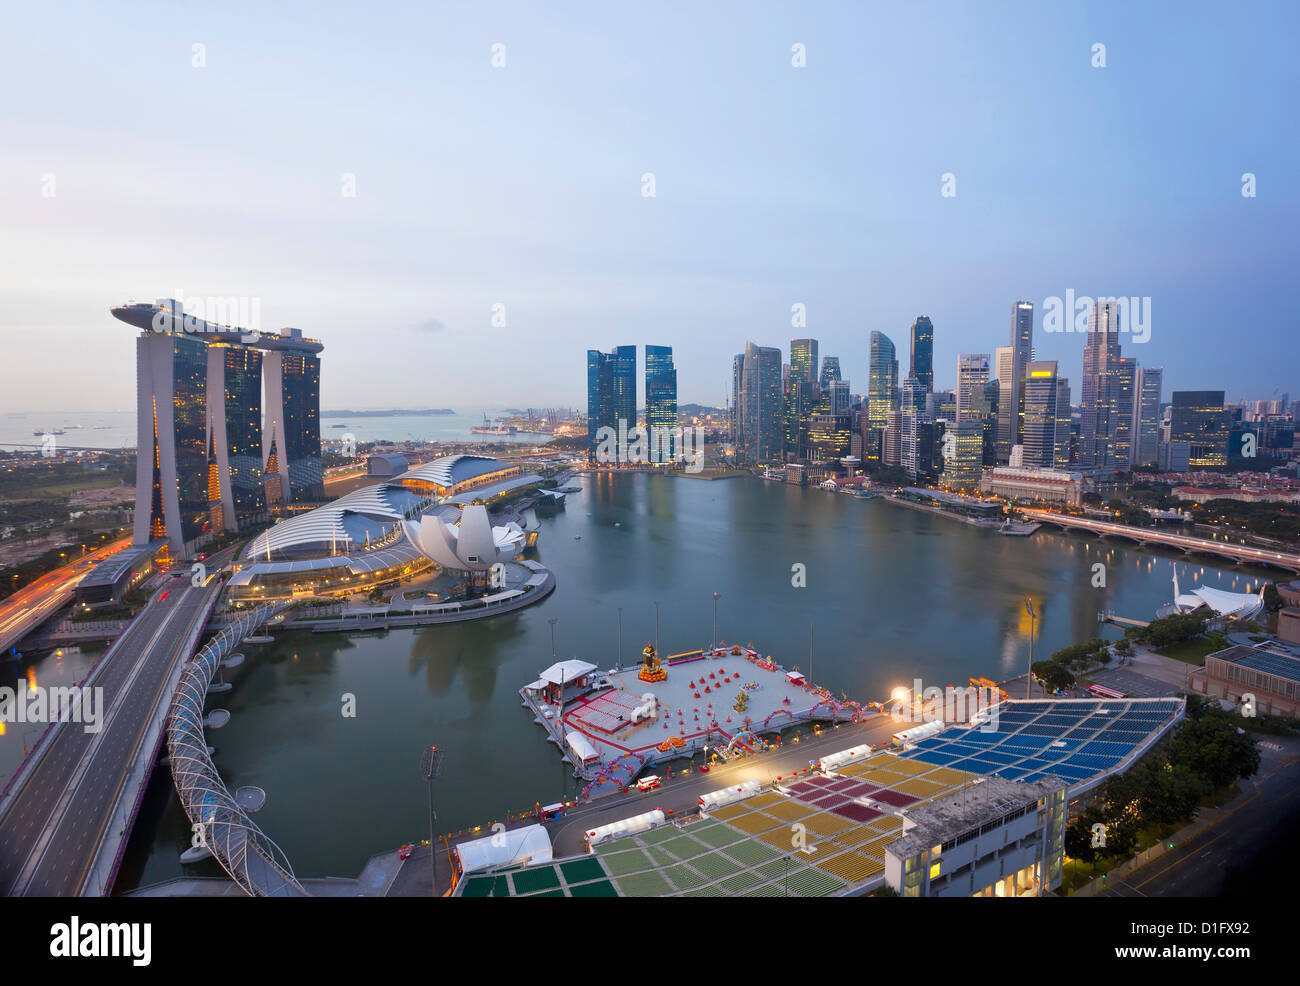 El Helix Bridge y Marina Bay Sands, niveles elevados de vistas de Singapur, Marina Bay, Singapur, Sudeste de Asia, Imagen De Stock